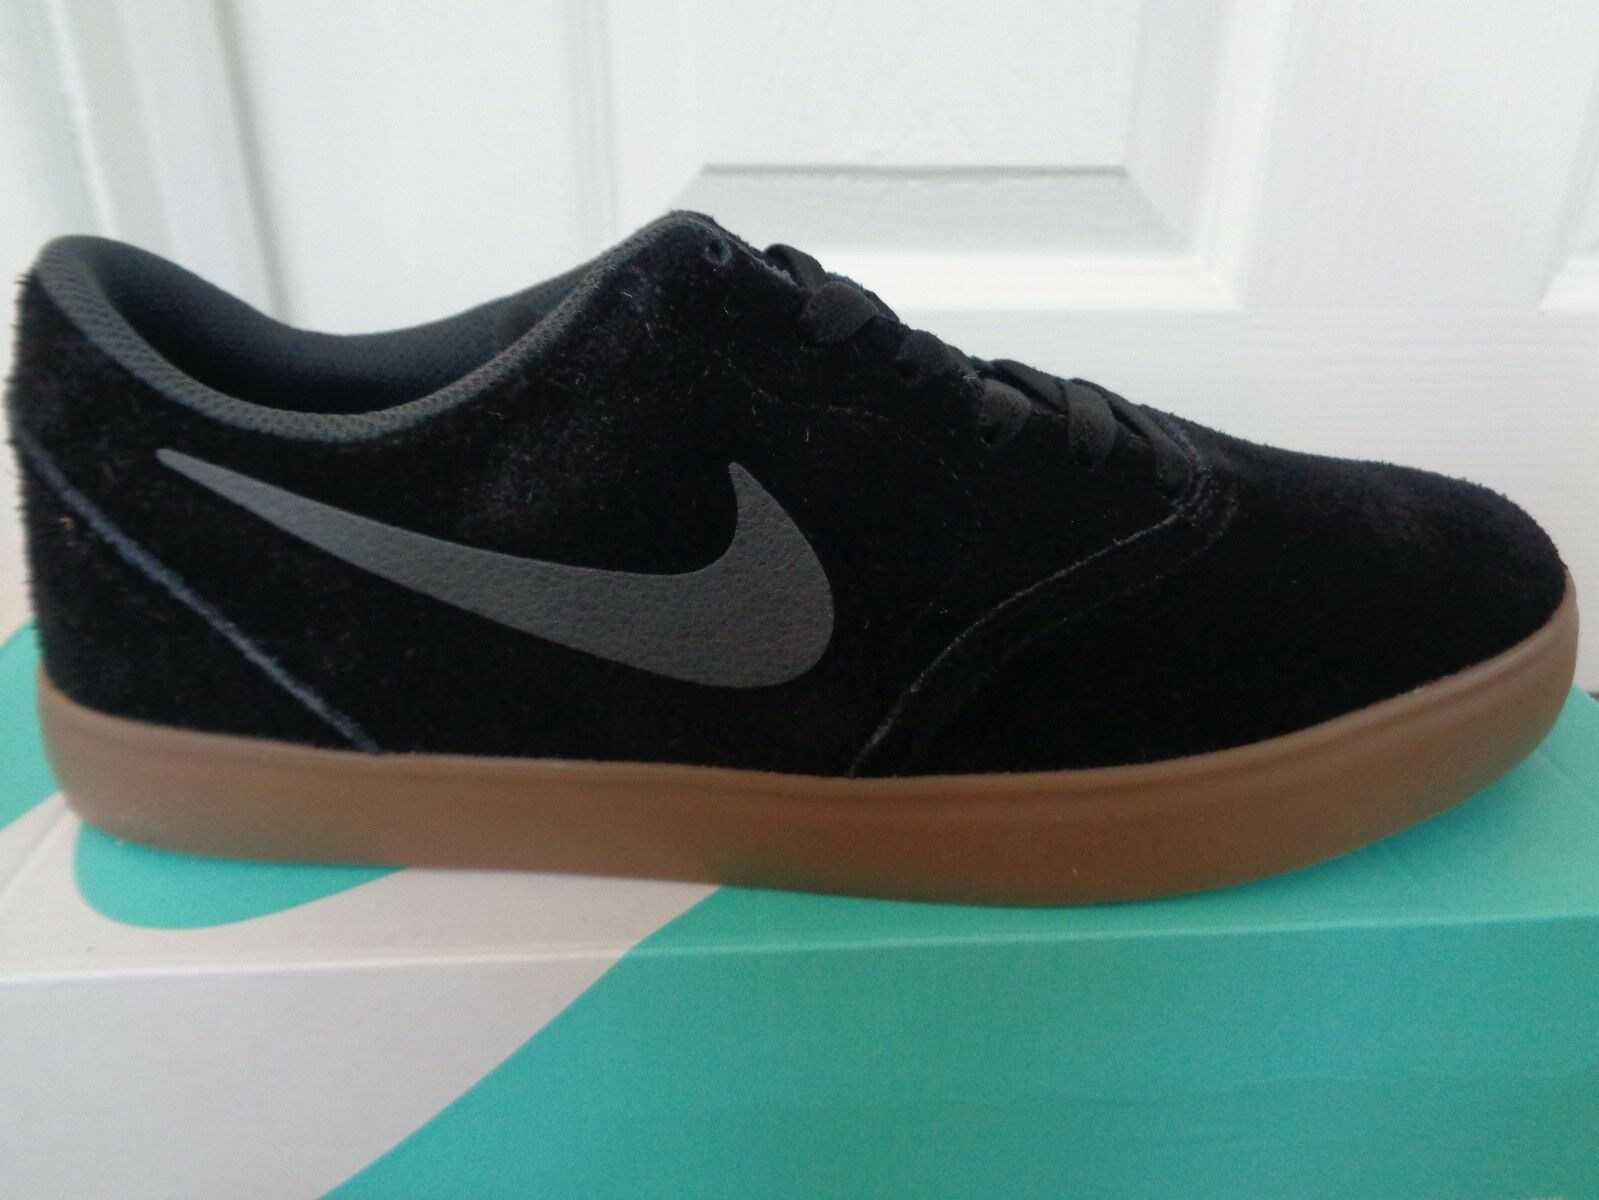 Nike SB Check Check Check Scarpe Ginnastica 705265 003 EU 42 US 8.5 Nuovo + Scatola 5b780b